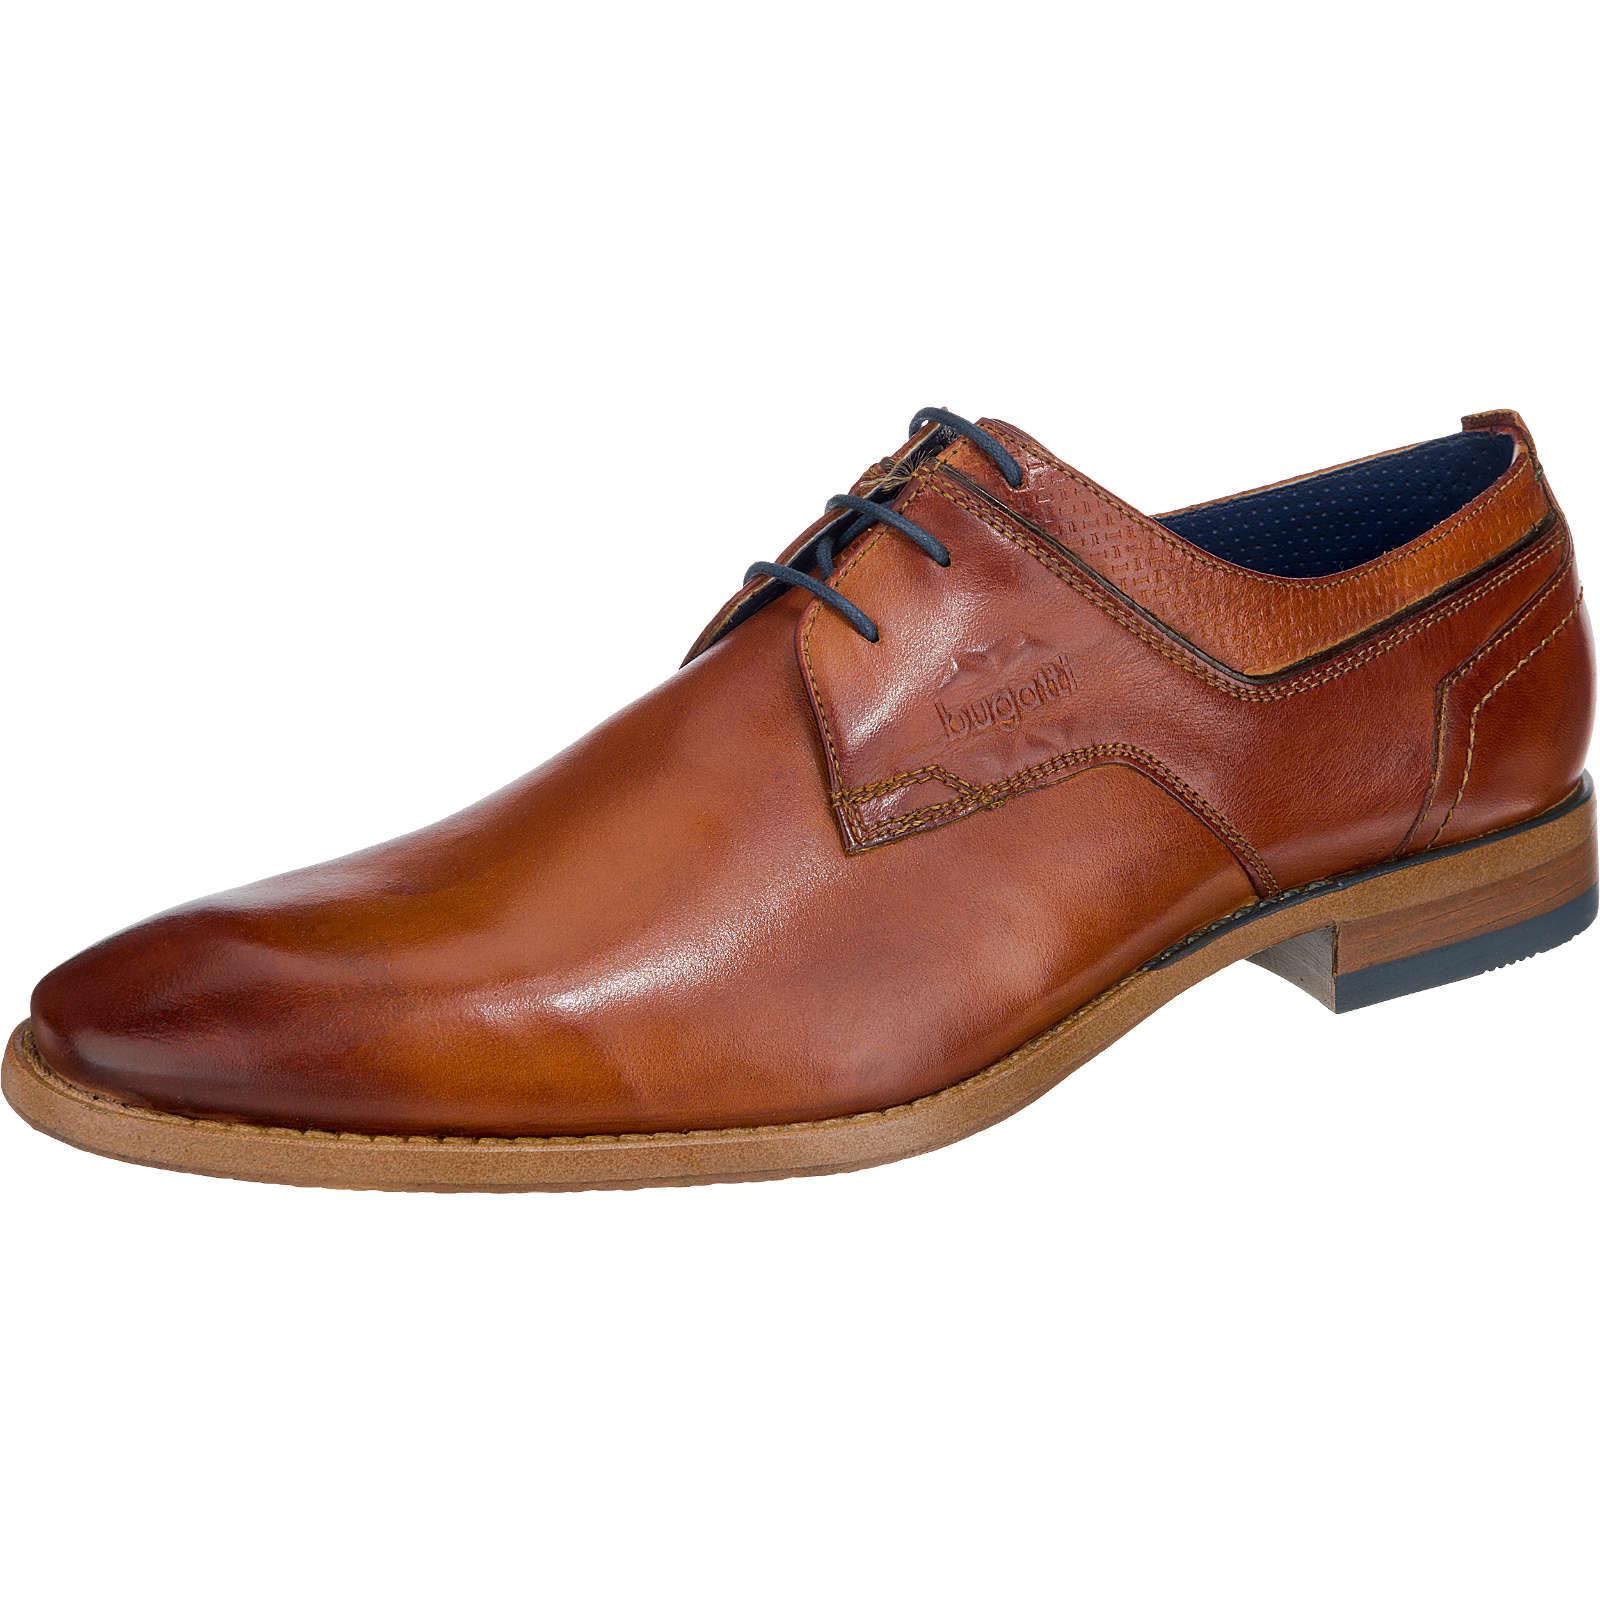 bugatti Business Schuhe braun-kombi Herren Gr. 44